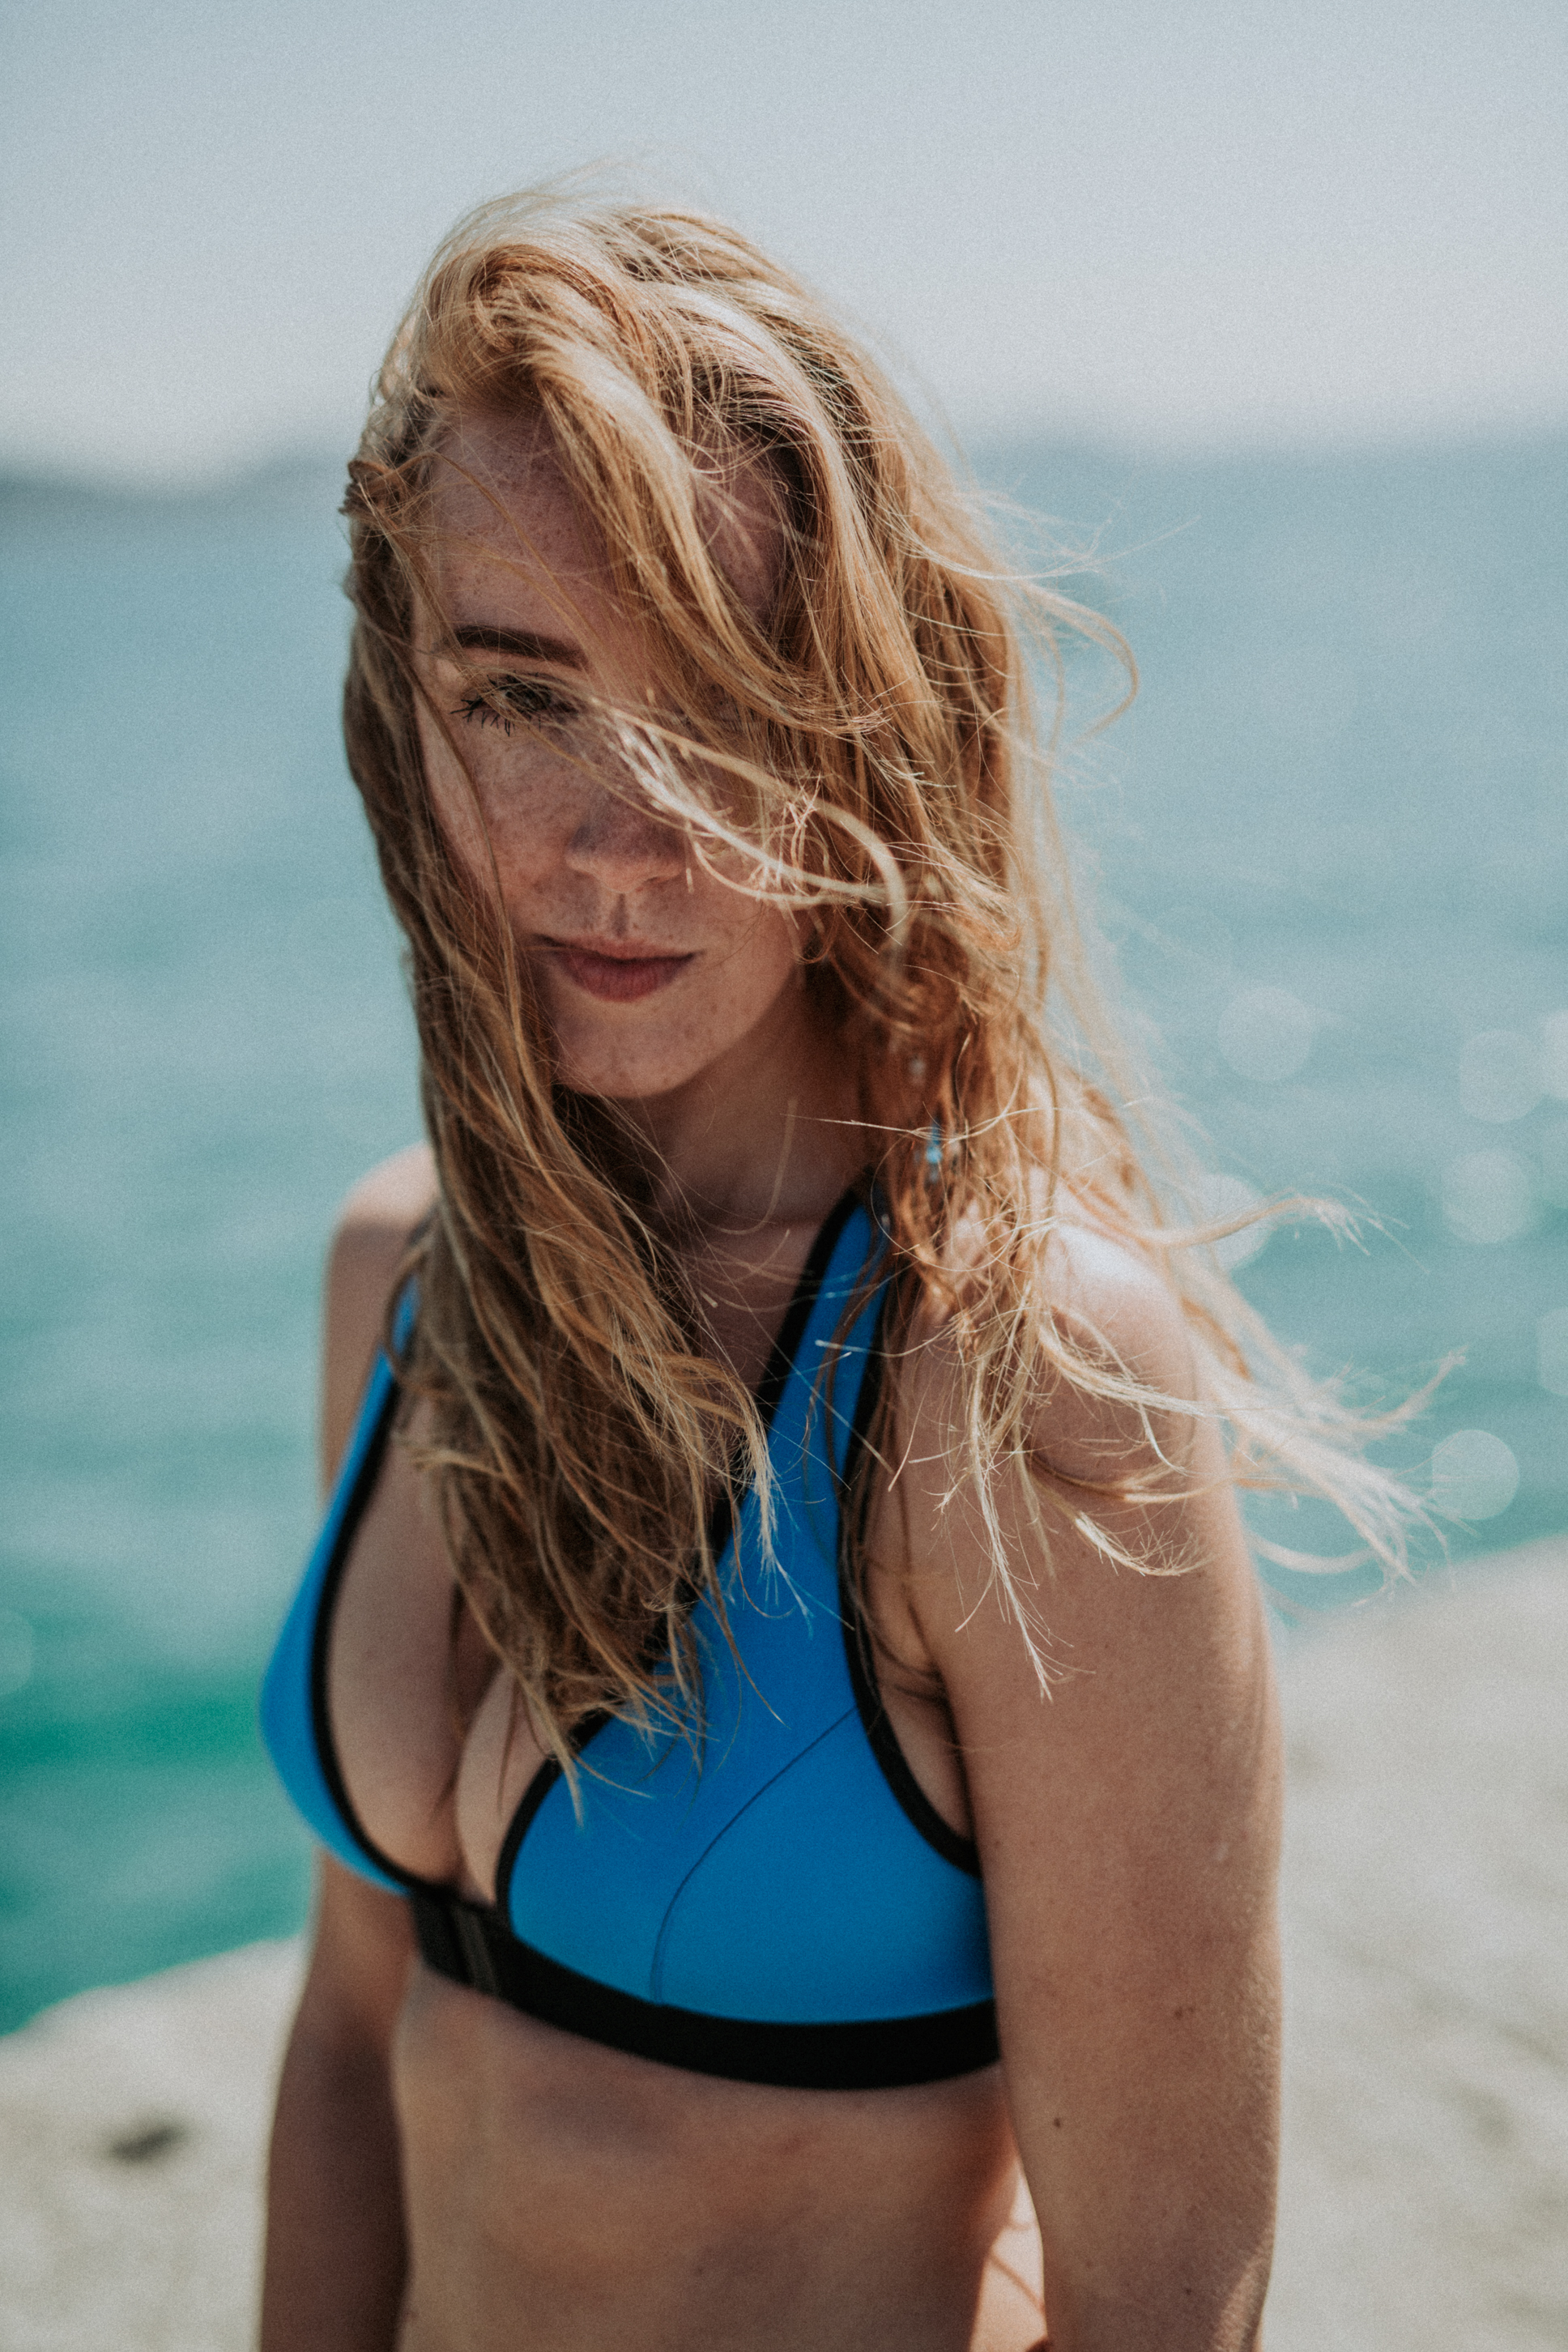 Davy J Blue Bikini